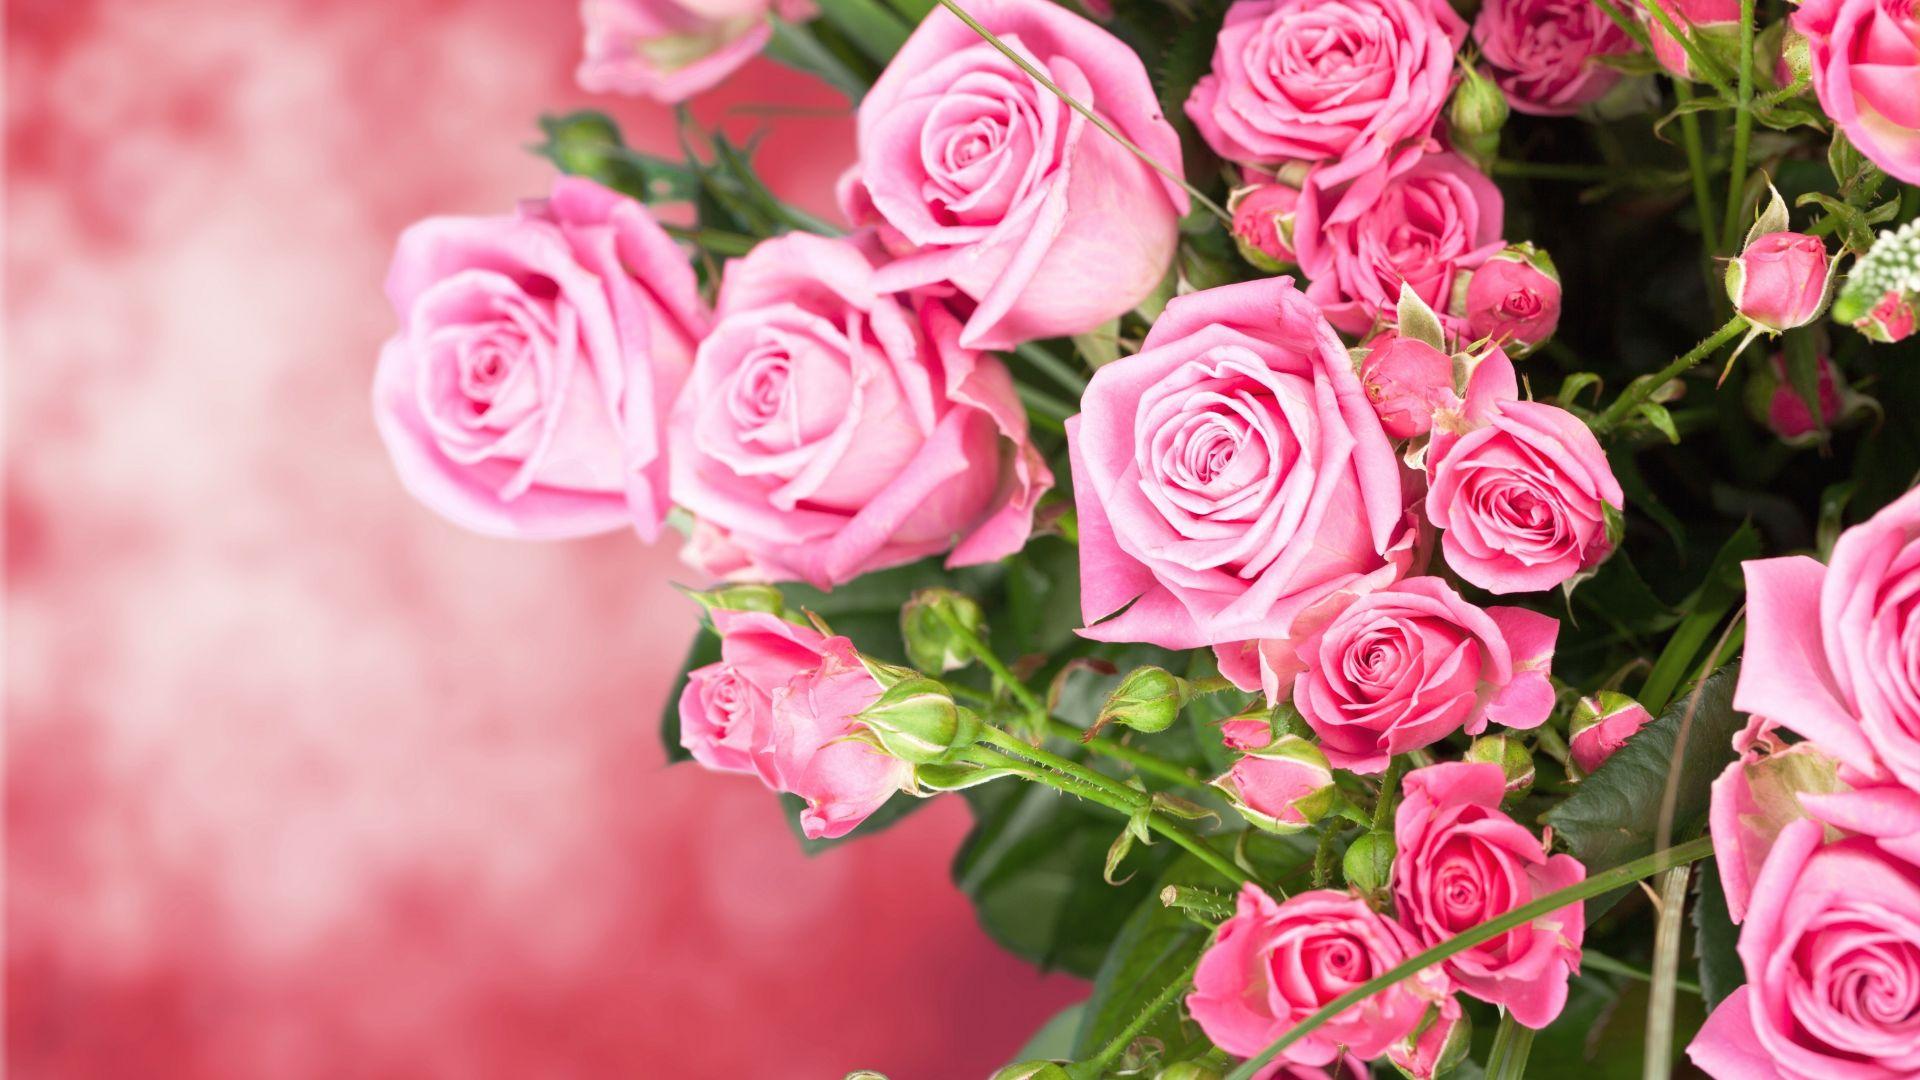 Pink Roses Bouquet Flowers Beautiful Wallpaper